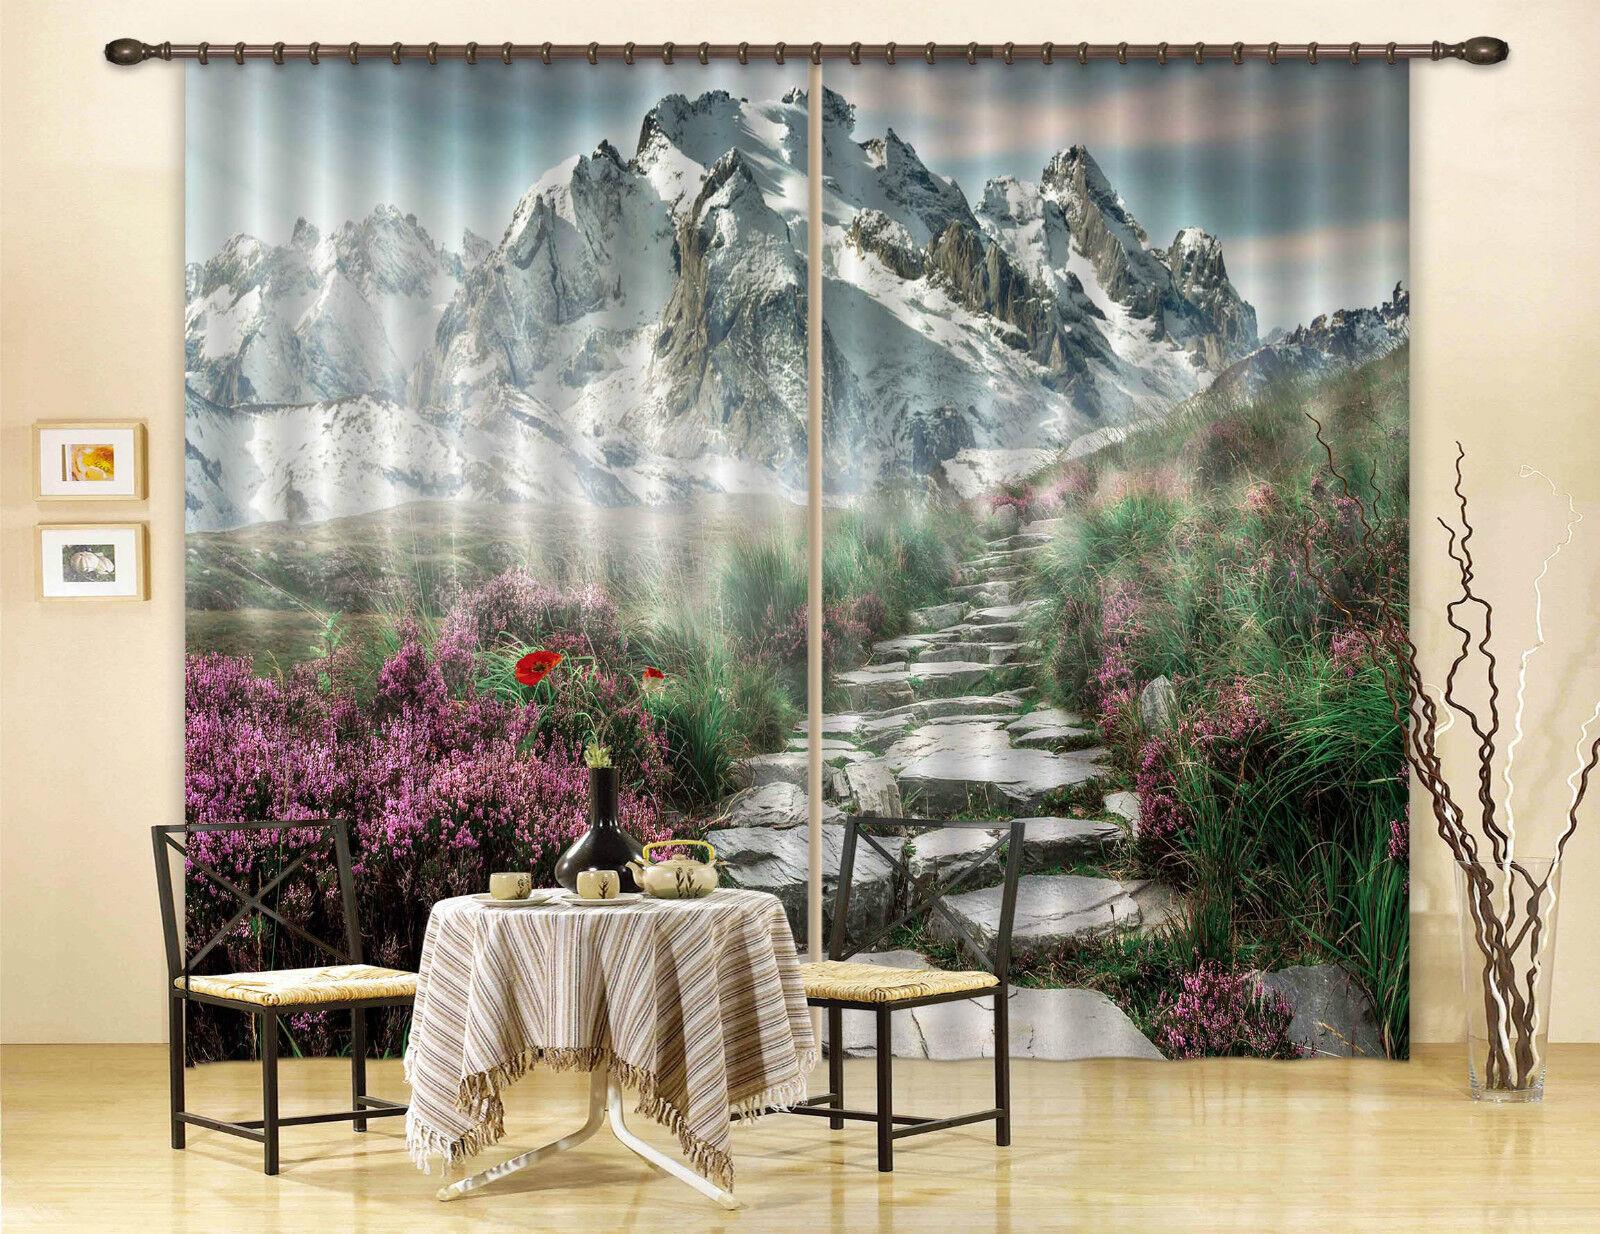 3d Berg flor 6344 bloqueo foto cortina cortina de impresión sustancia cortinas de ventana